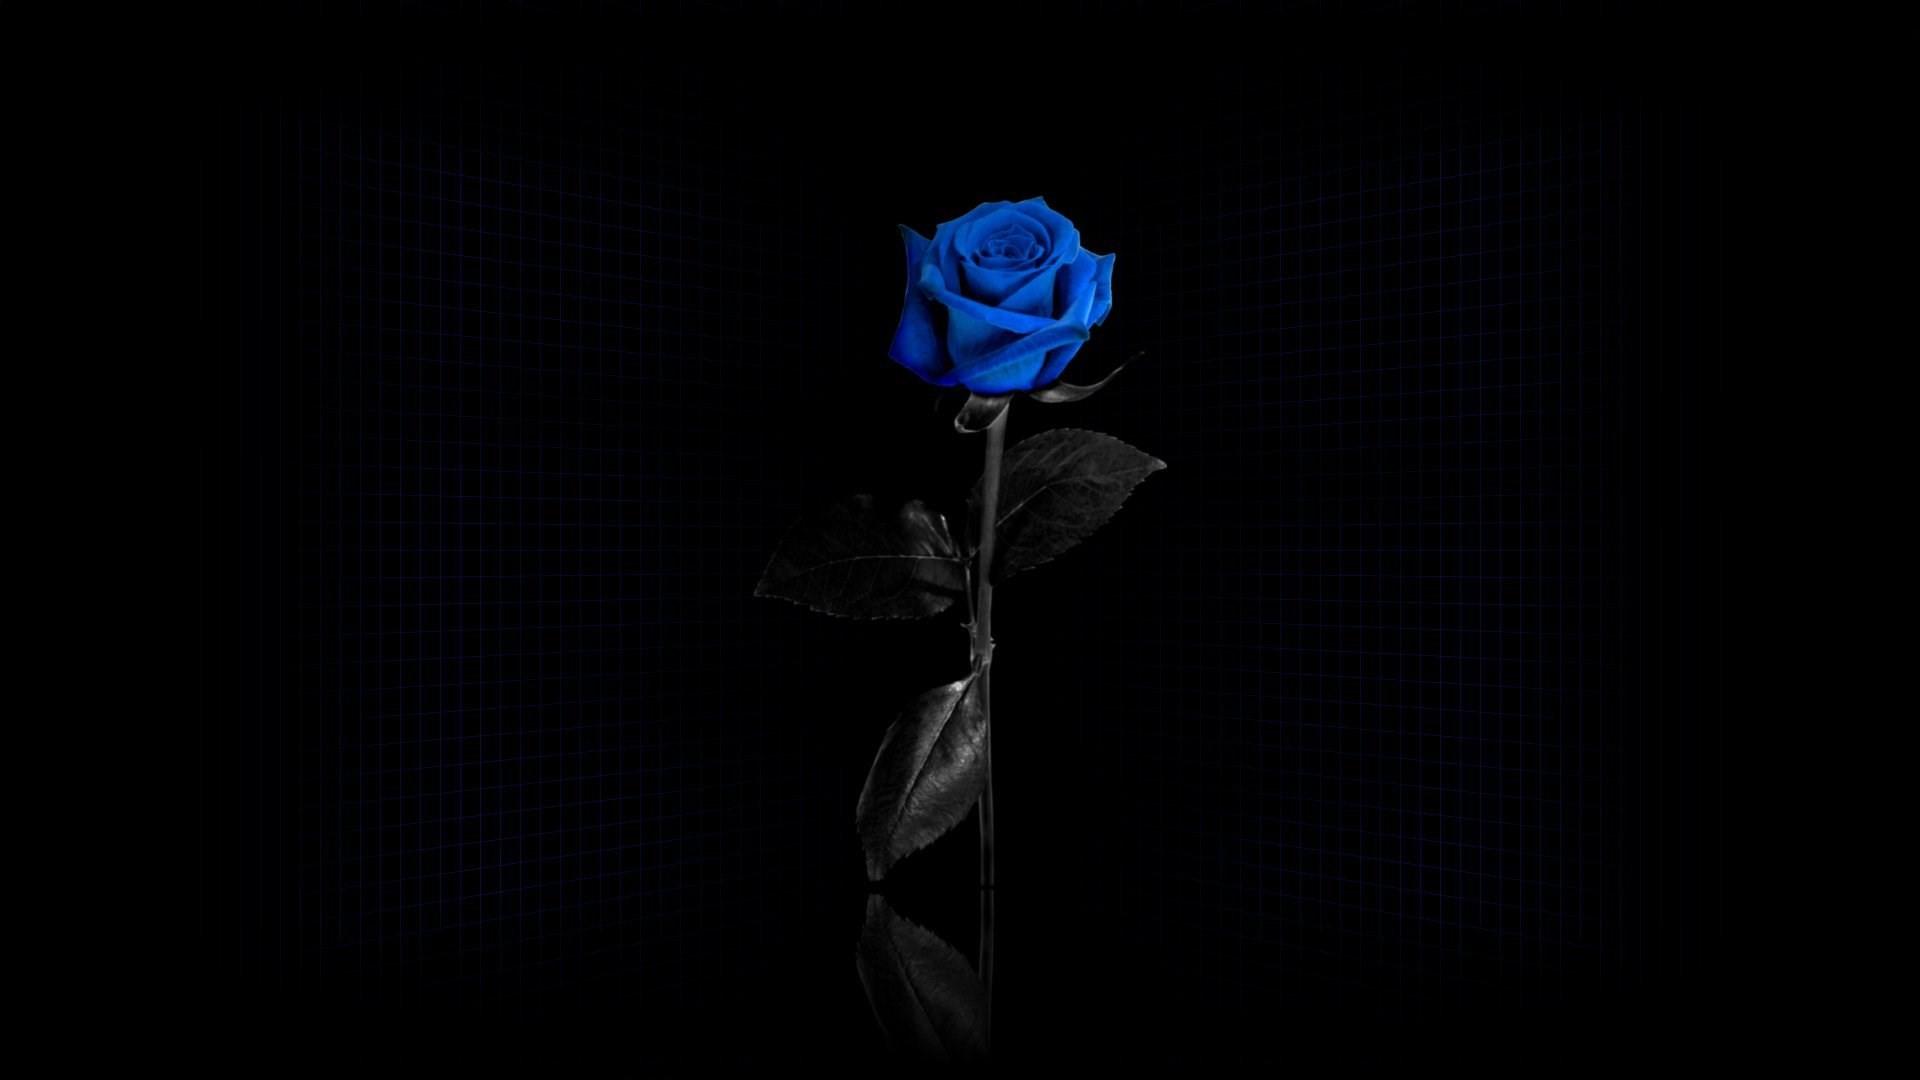 blue rose wallpaper 1080p windows by Edita Sinclair (2016-09-19)